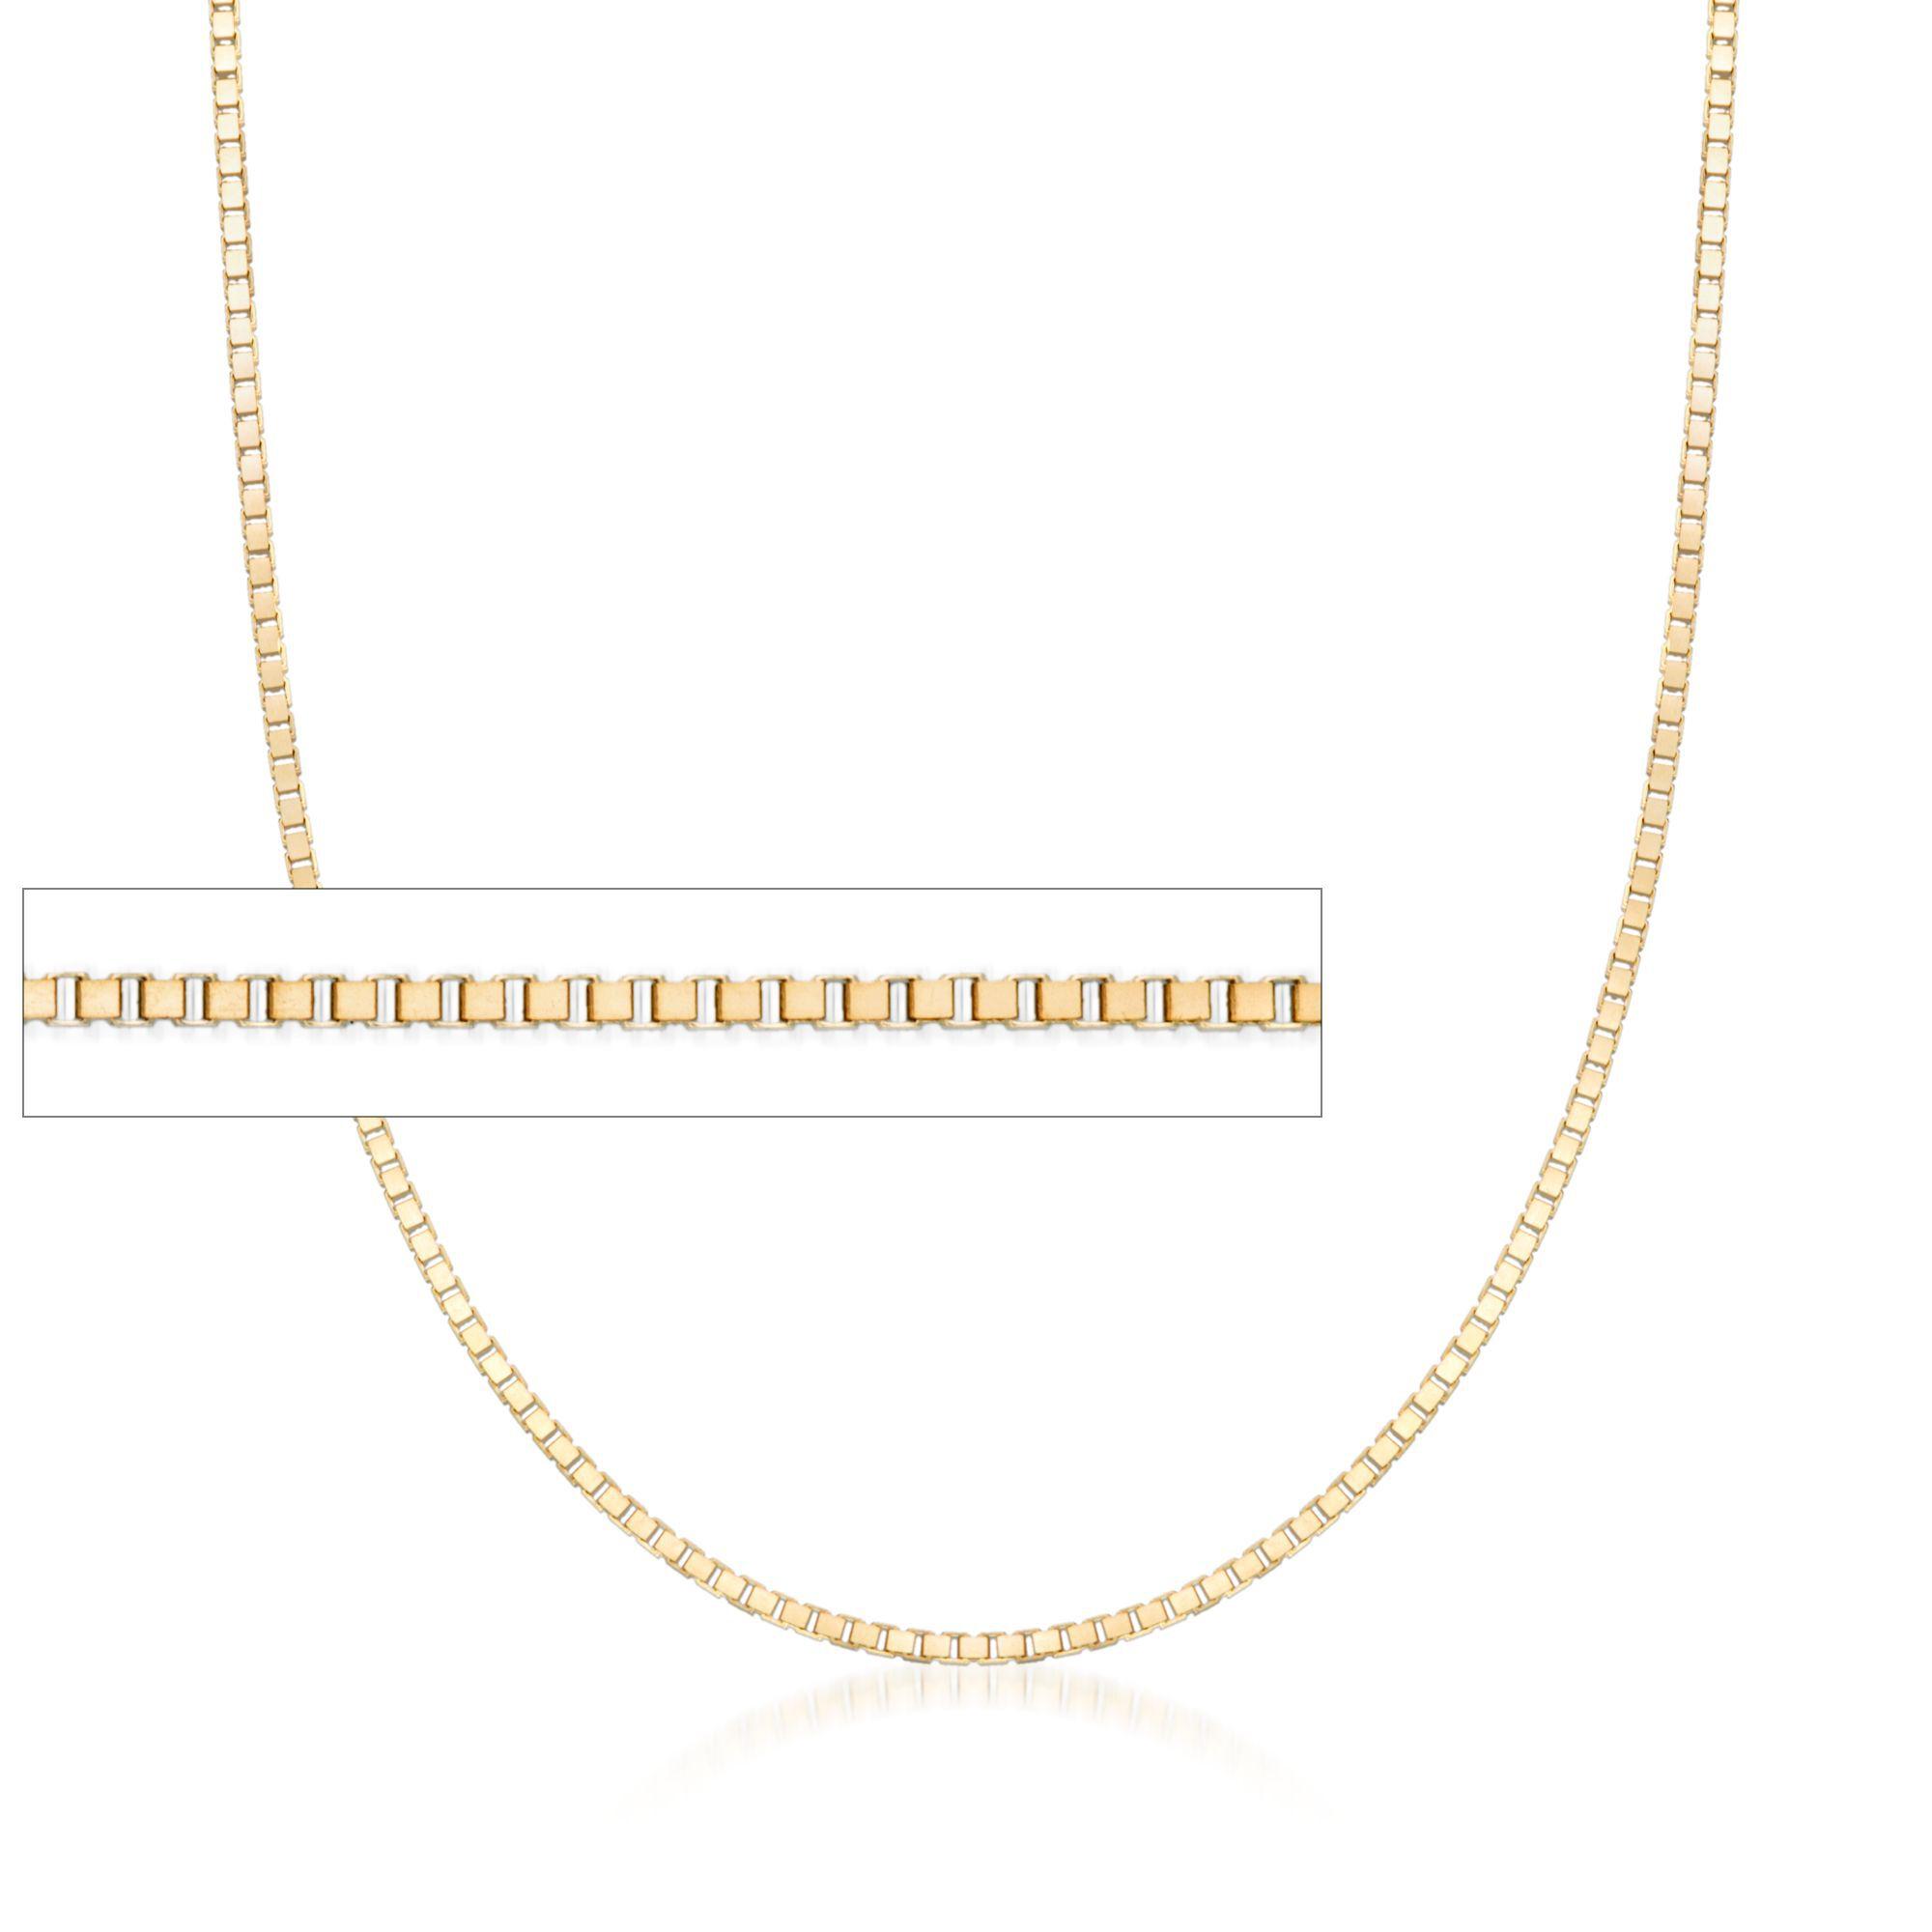 14K White Gold 1.2 Franco Chain in 16 inch 20 inch 24 inch 18 inch